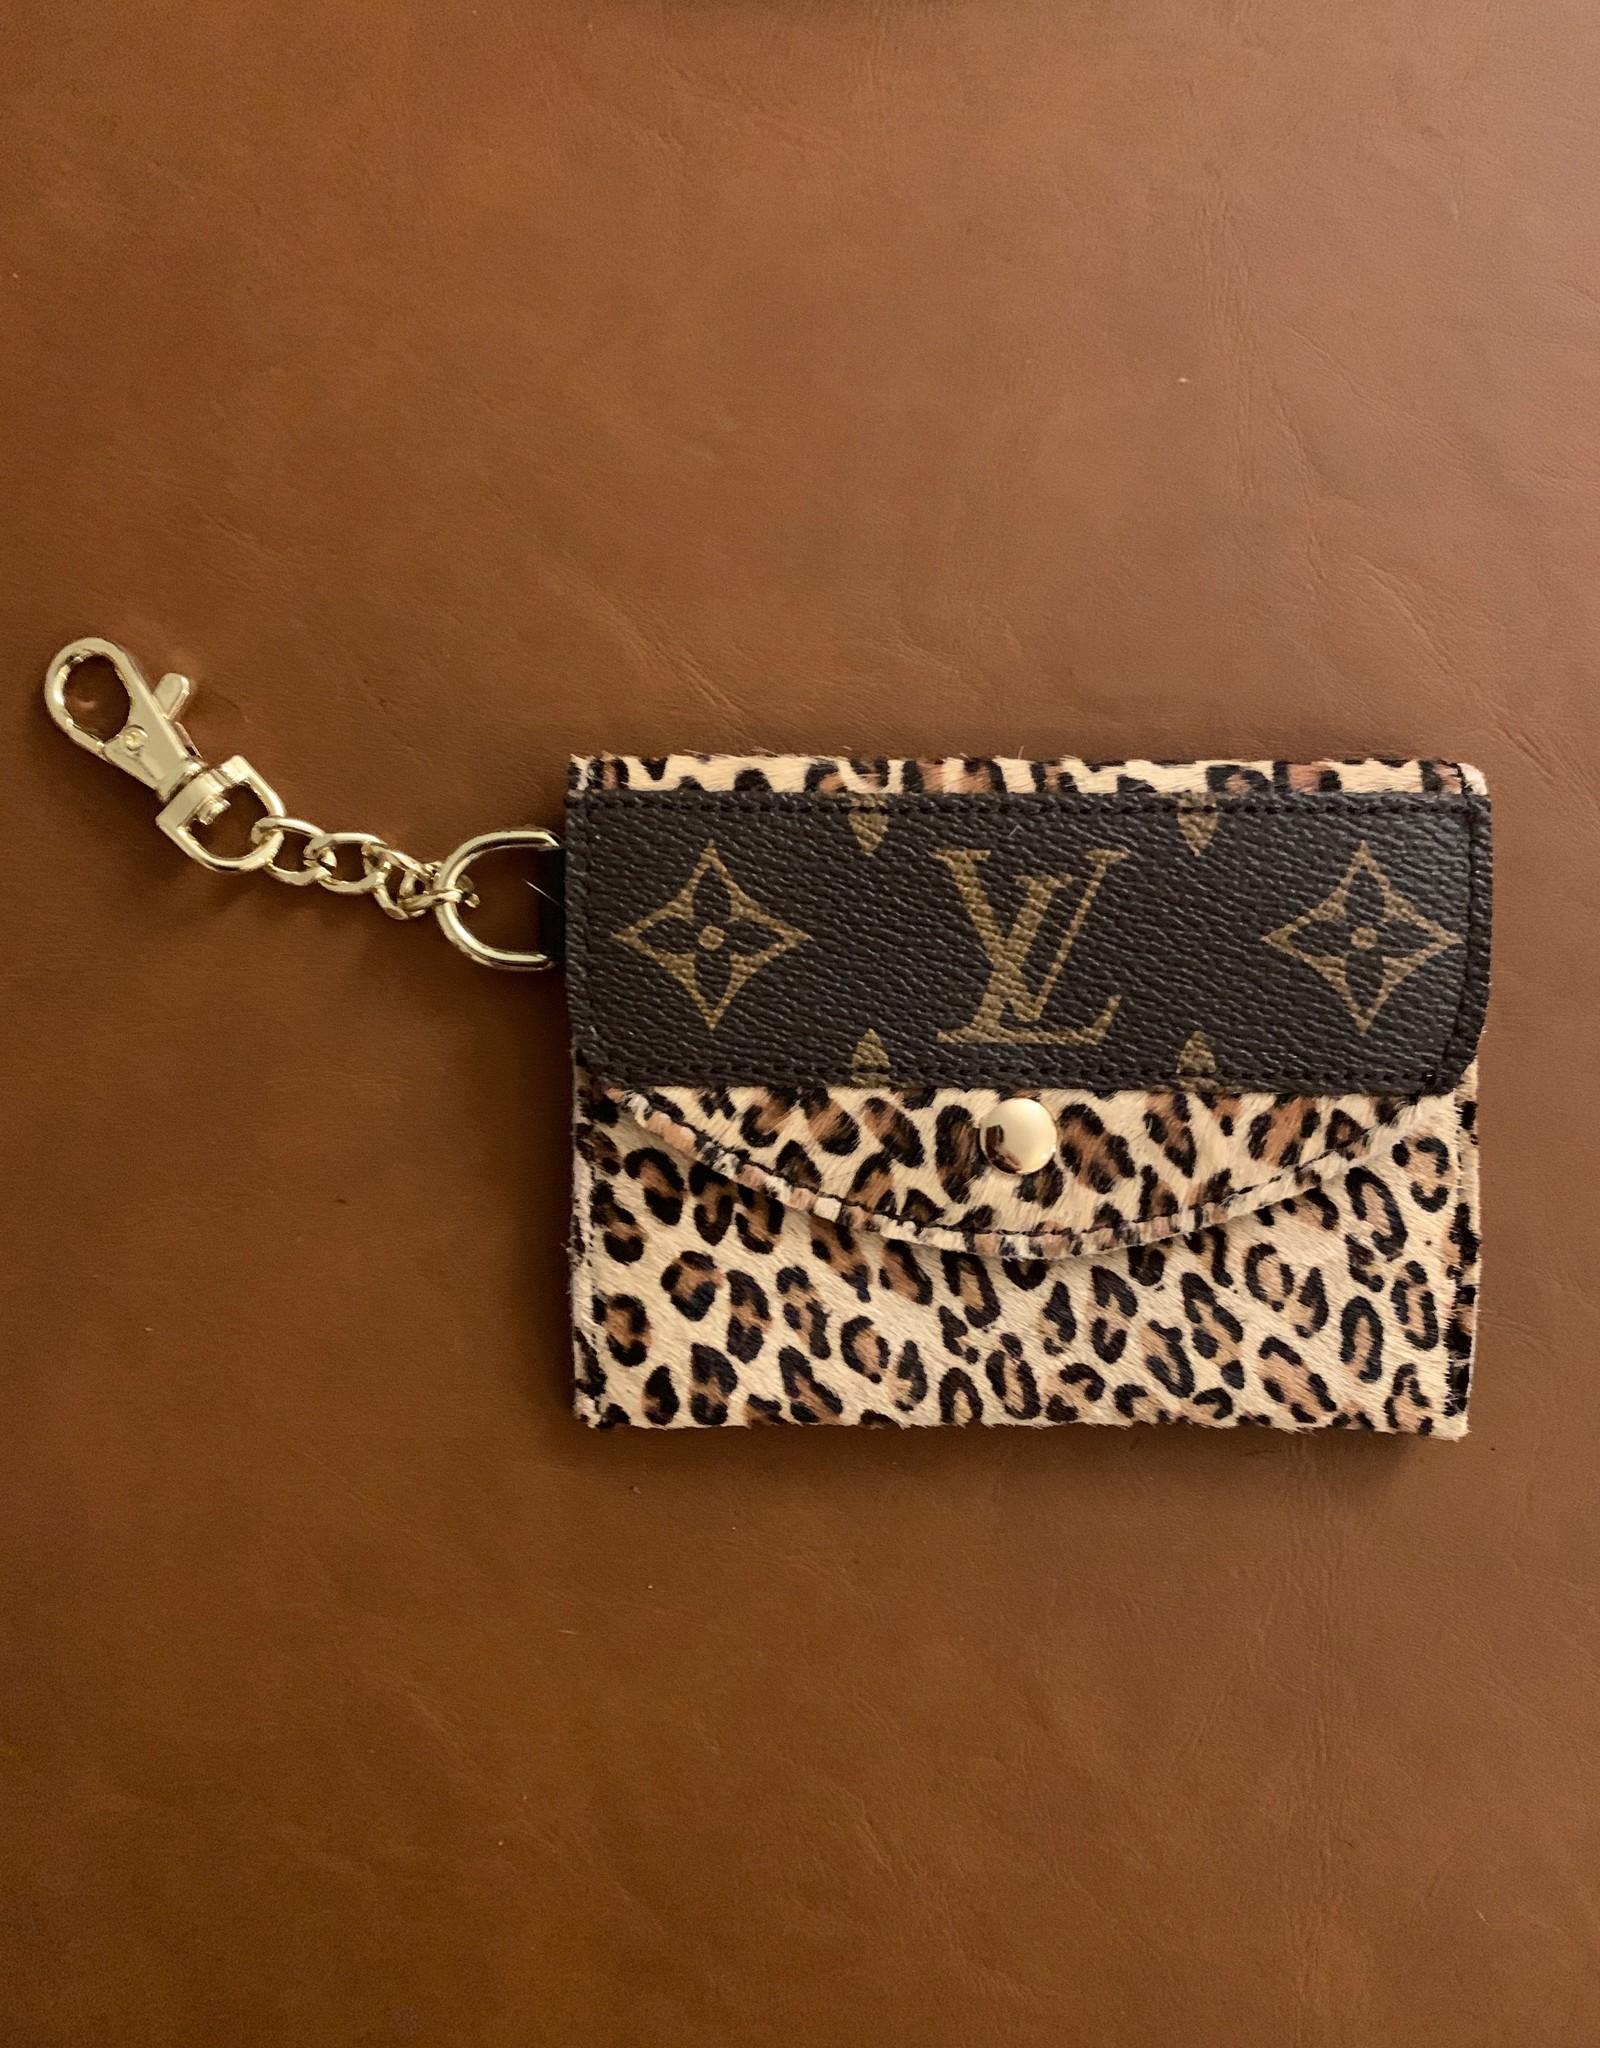 - Light Tan Cheetah Upcycled Louis Vuitton Cardholder